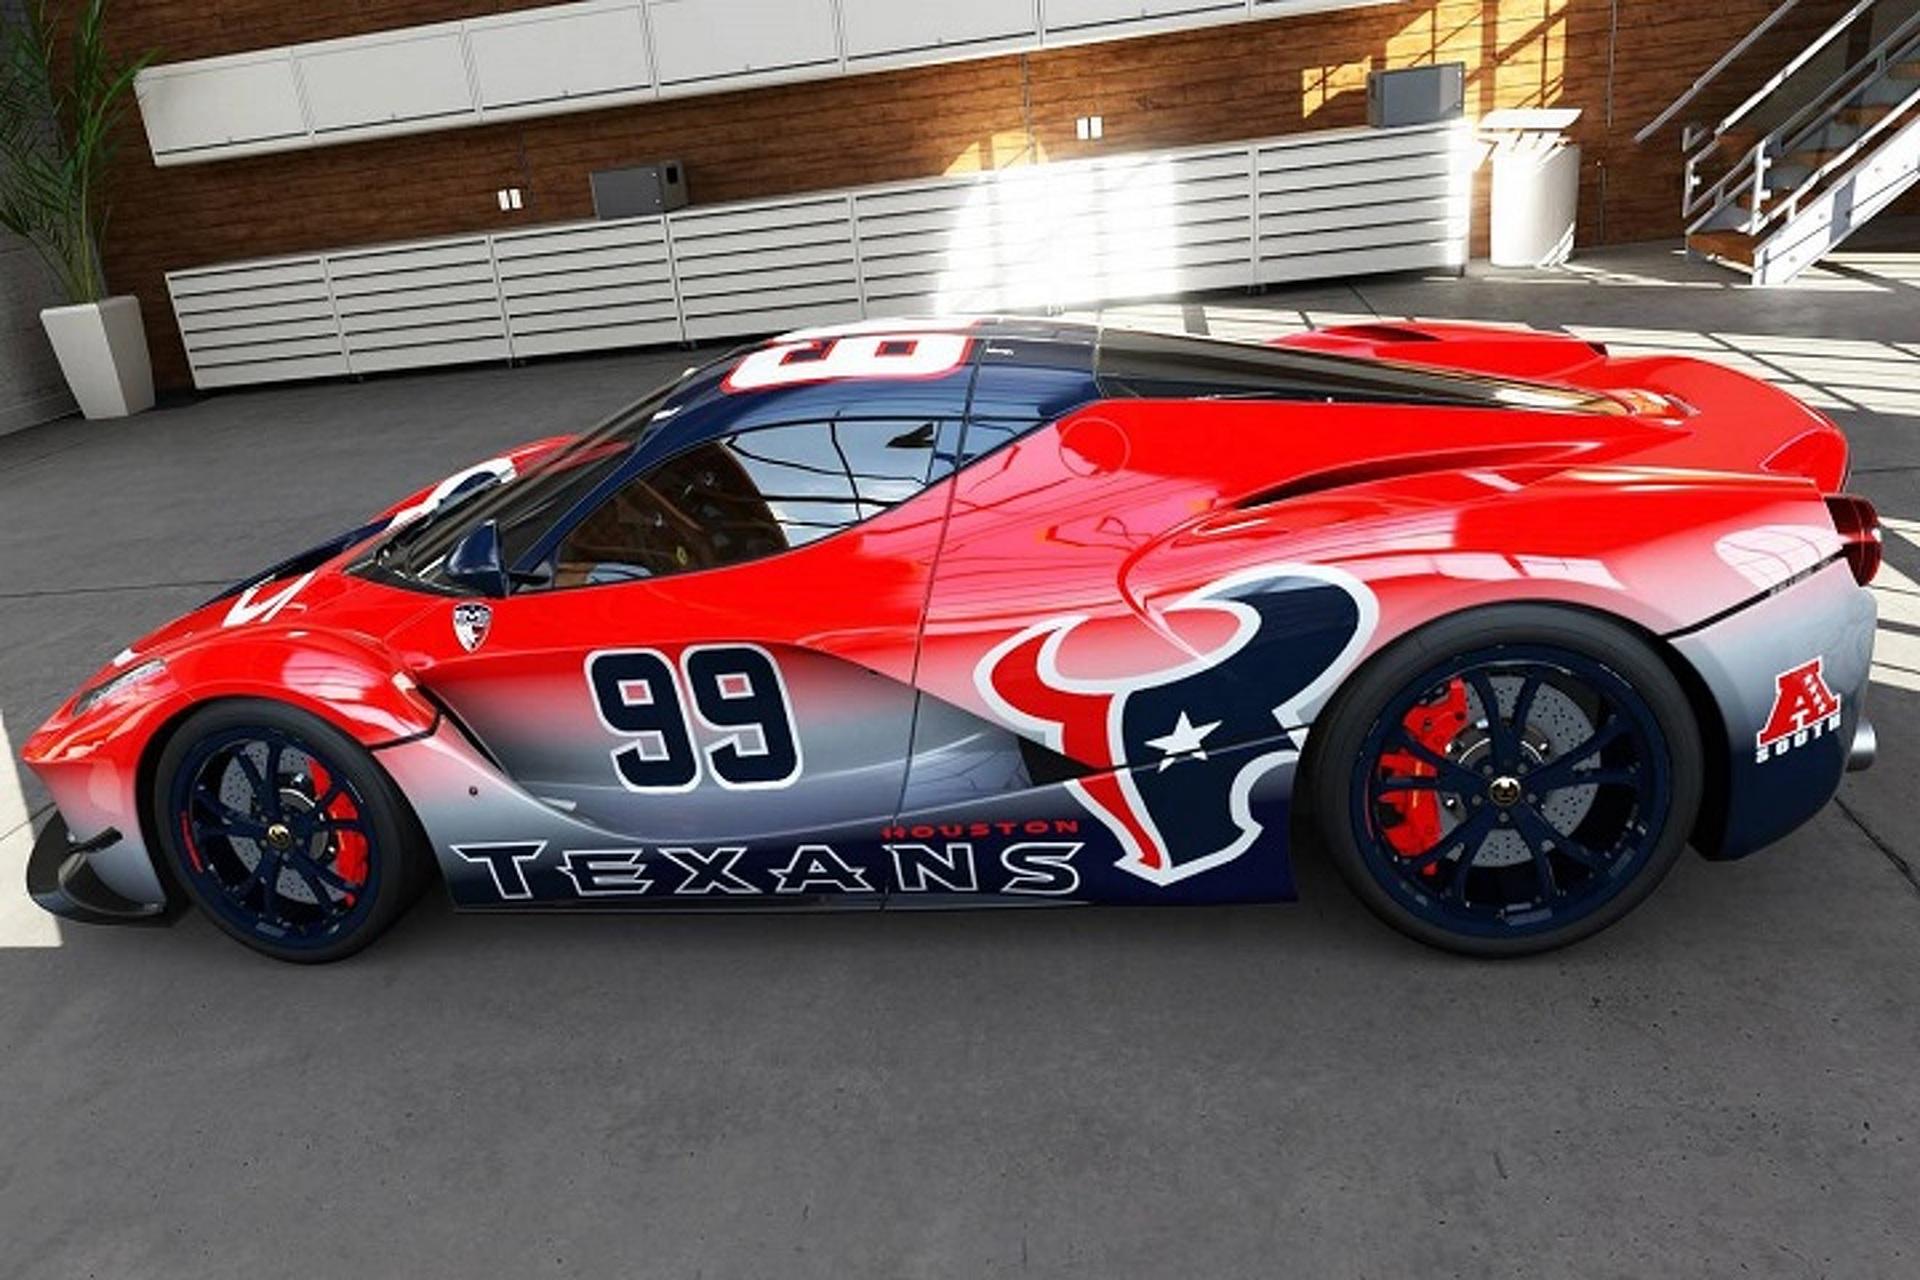 Ferrari LaFerrari Gets a Houston Texans J.J. Watt Makeover